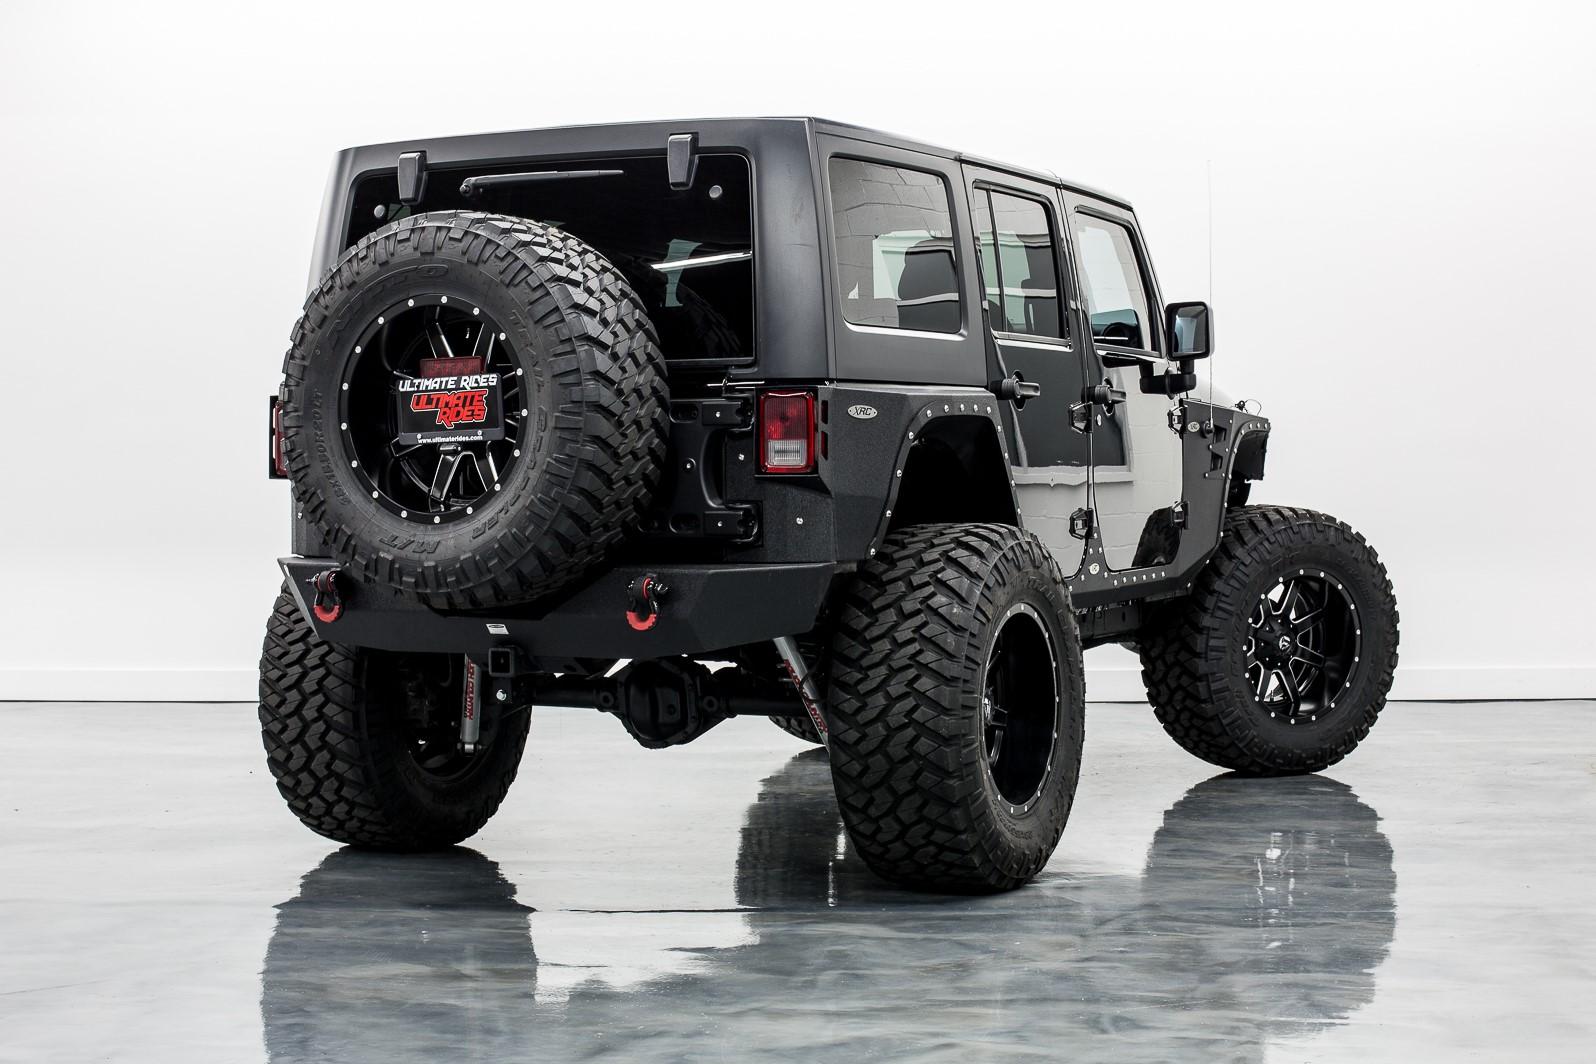 2015 jeep wrangler unlimited 4x4 ultimate rides. Black Bedroom Furniture Sets. Home Design Ideas